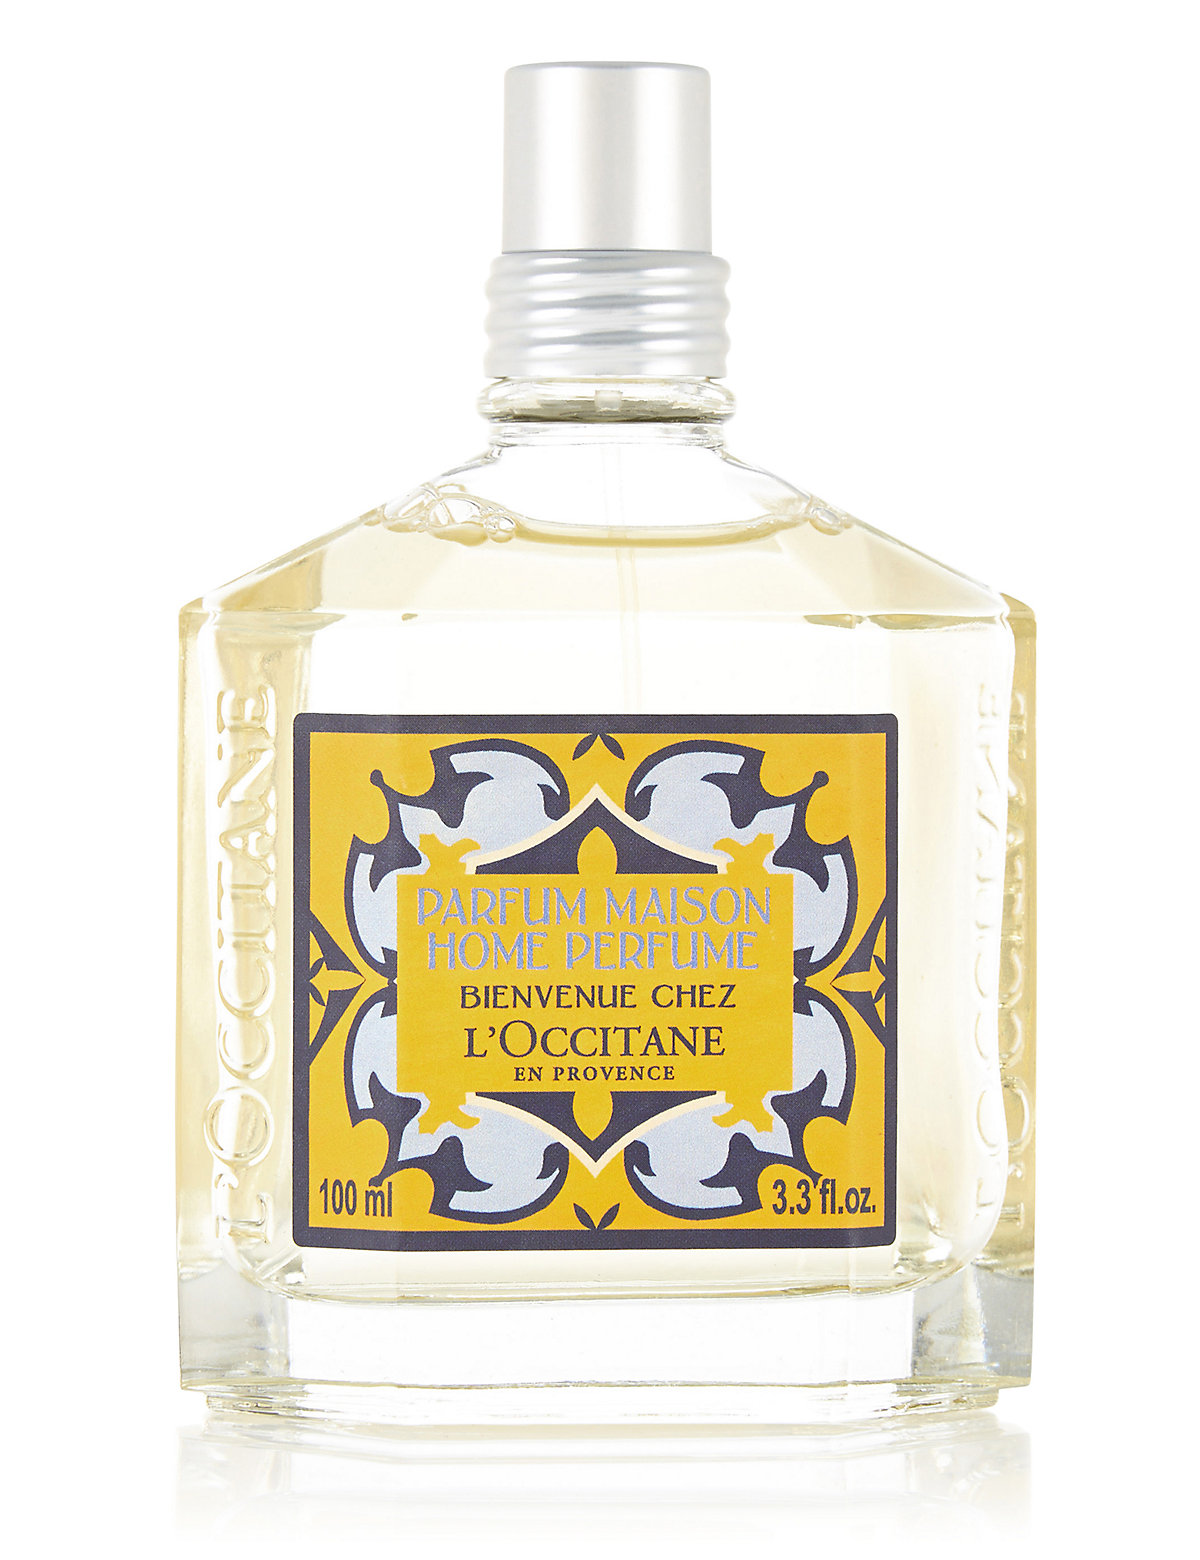 LOccitane Welcome Home Fragrance 100ml